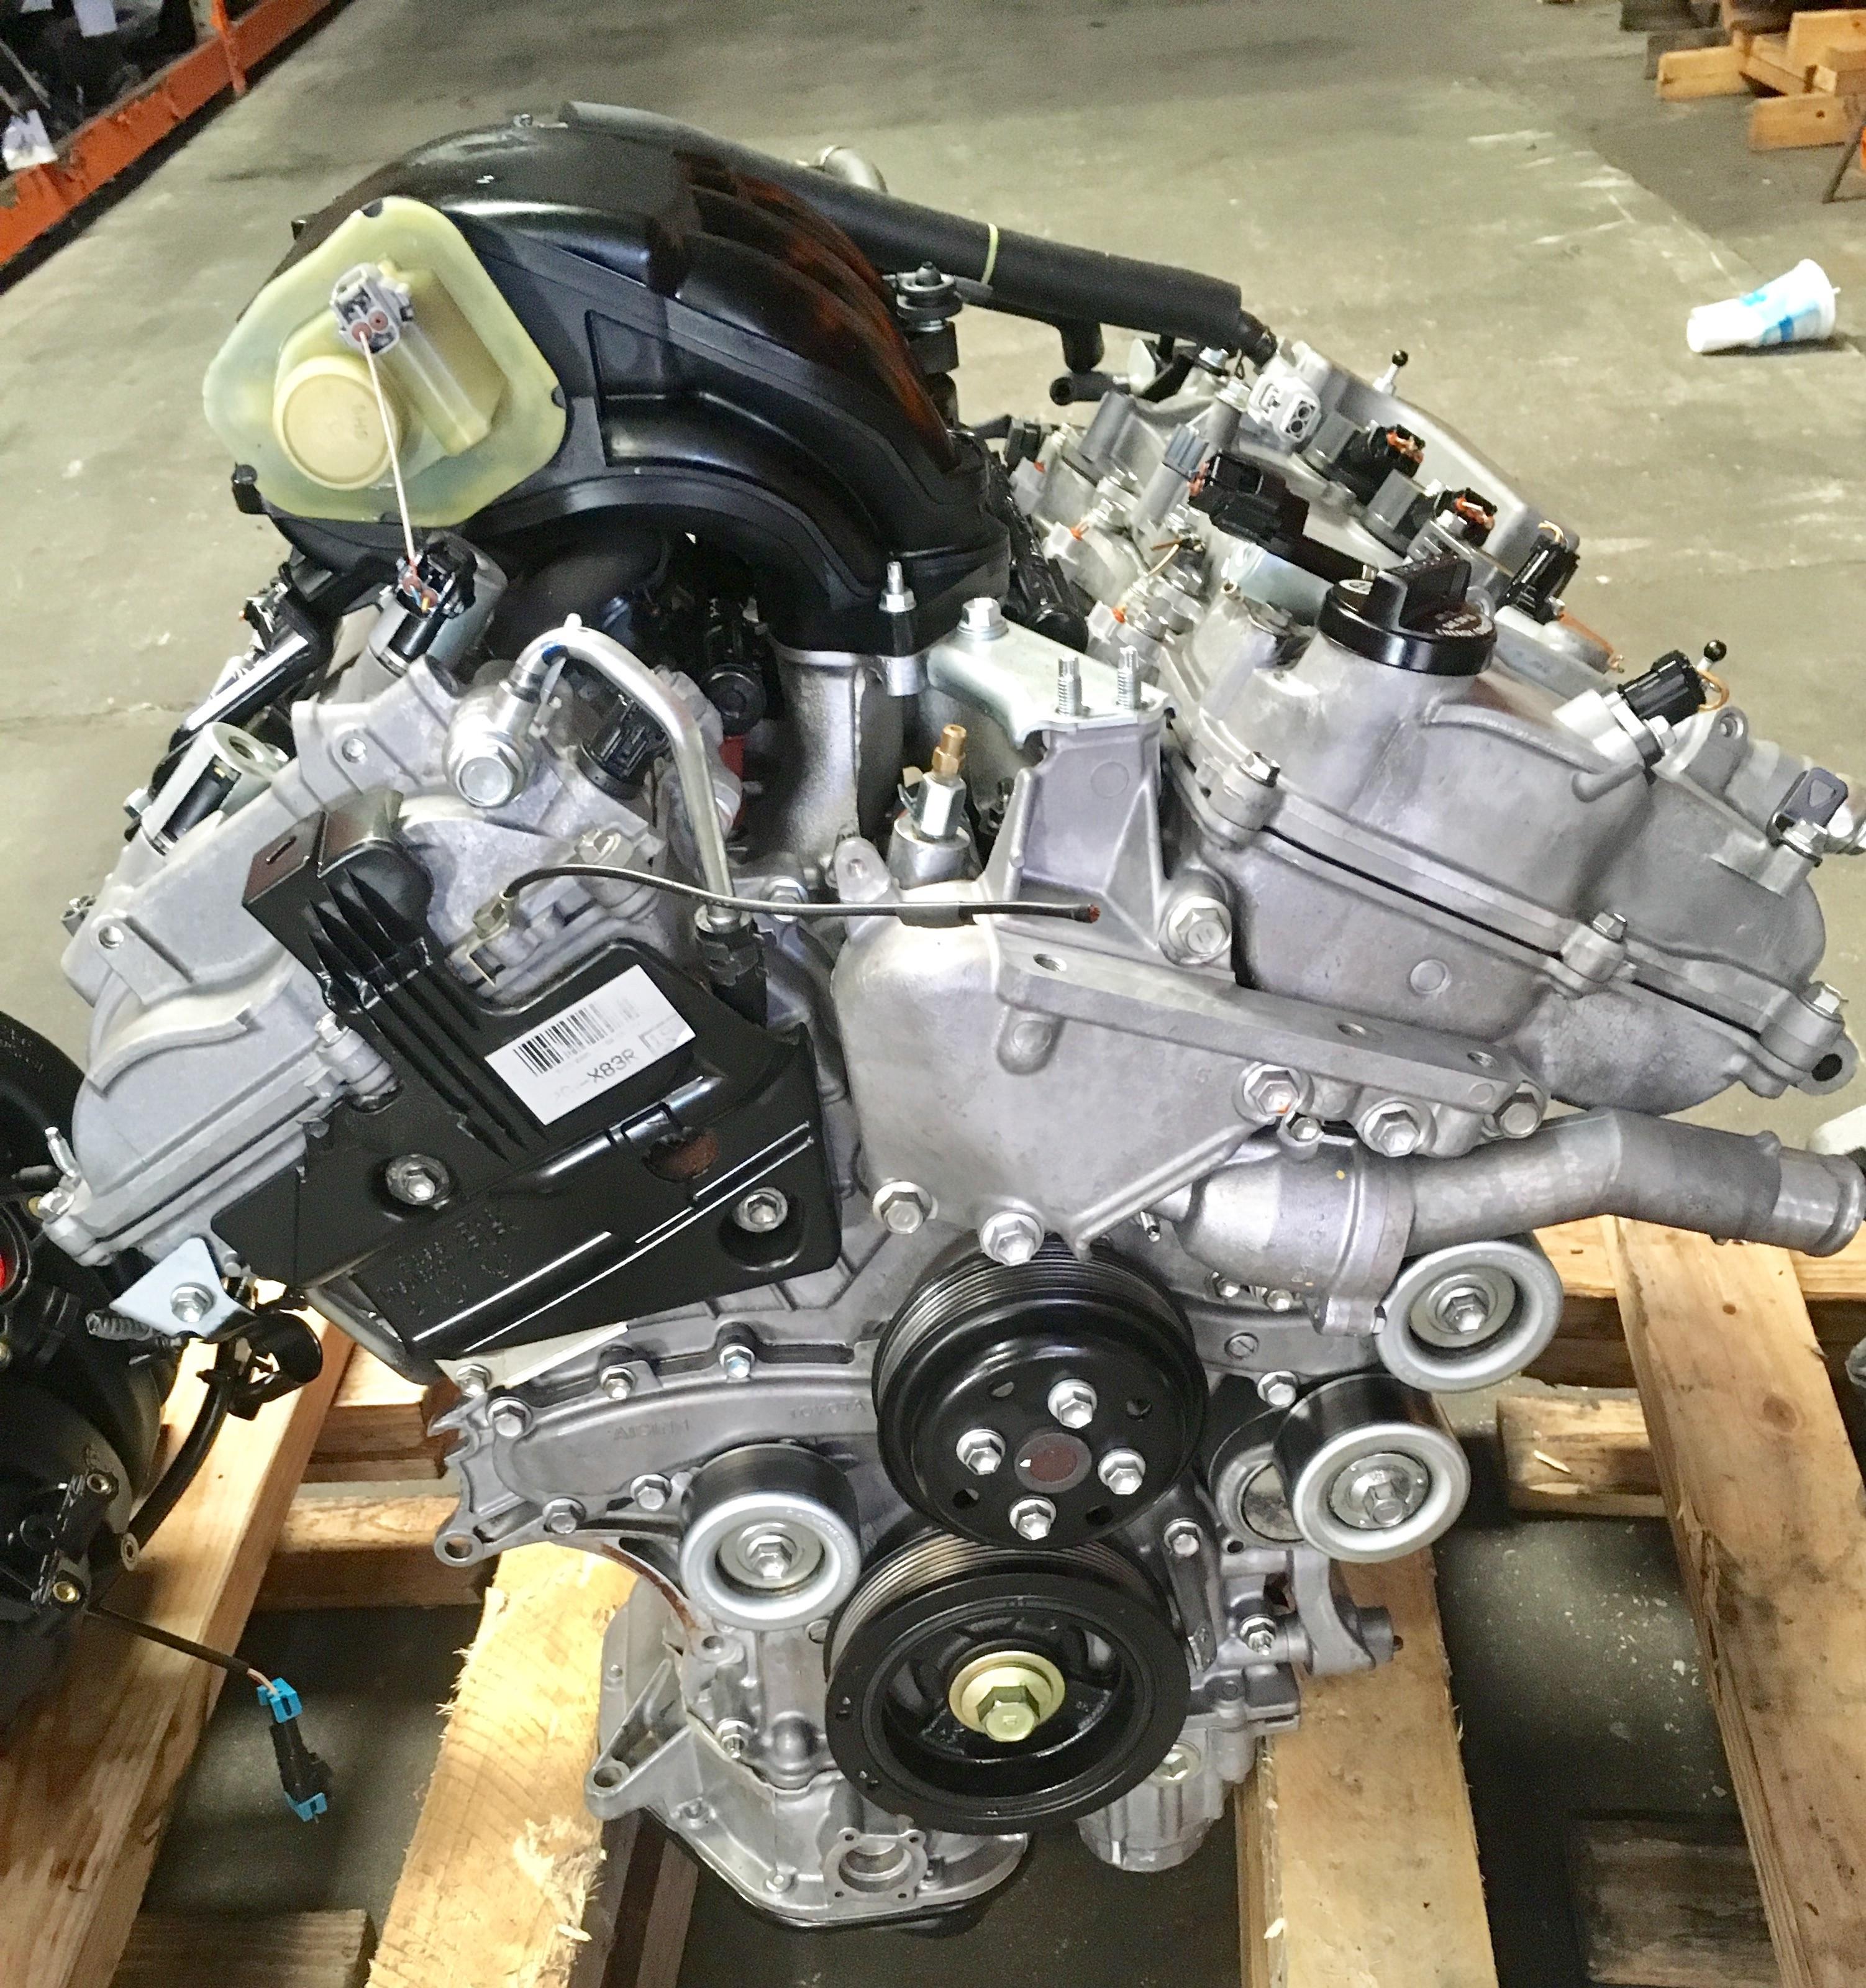 2006 toyota avalon engine diagram 2005 toyota camry starter rh detoxicrecenze com Toyota Corolla Engine Diagram 1997 Toyota Avalon Engine Diagram